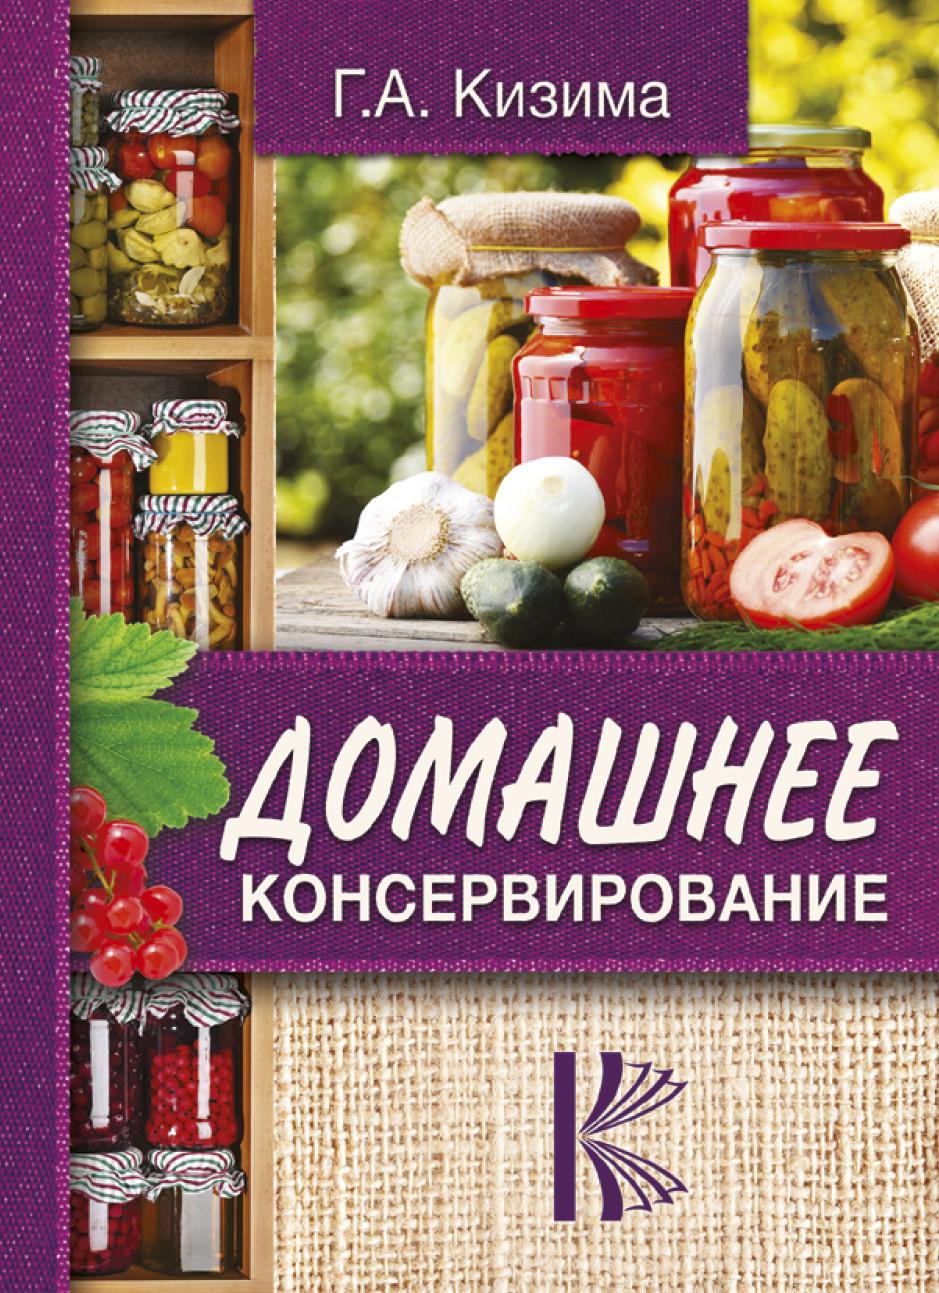 Кизима Г.А. Домашнее консервирование